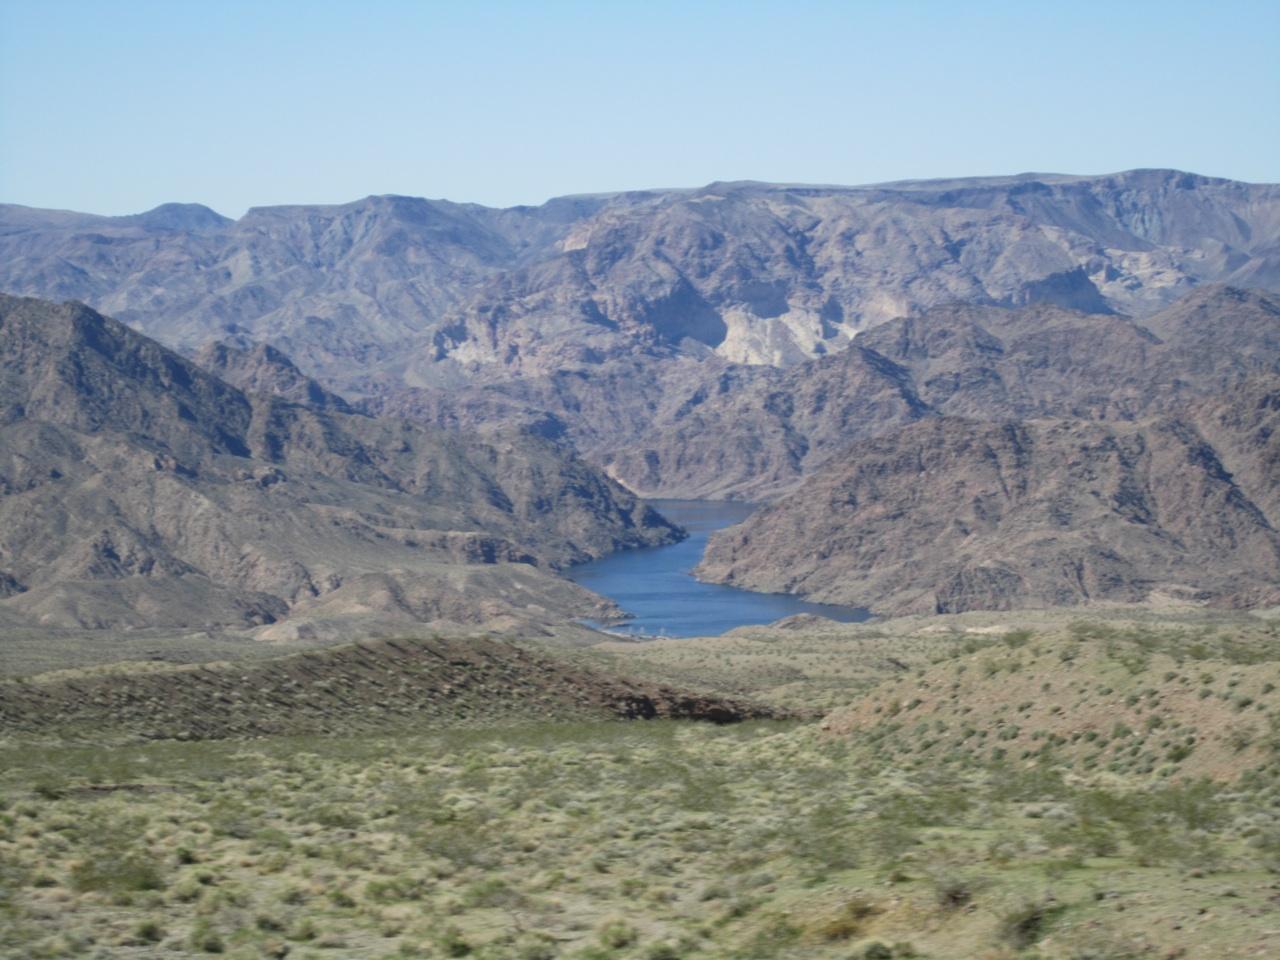 Beautiful Scenery On Our Way To Kingman, AZ